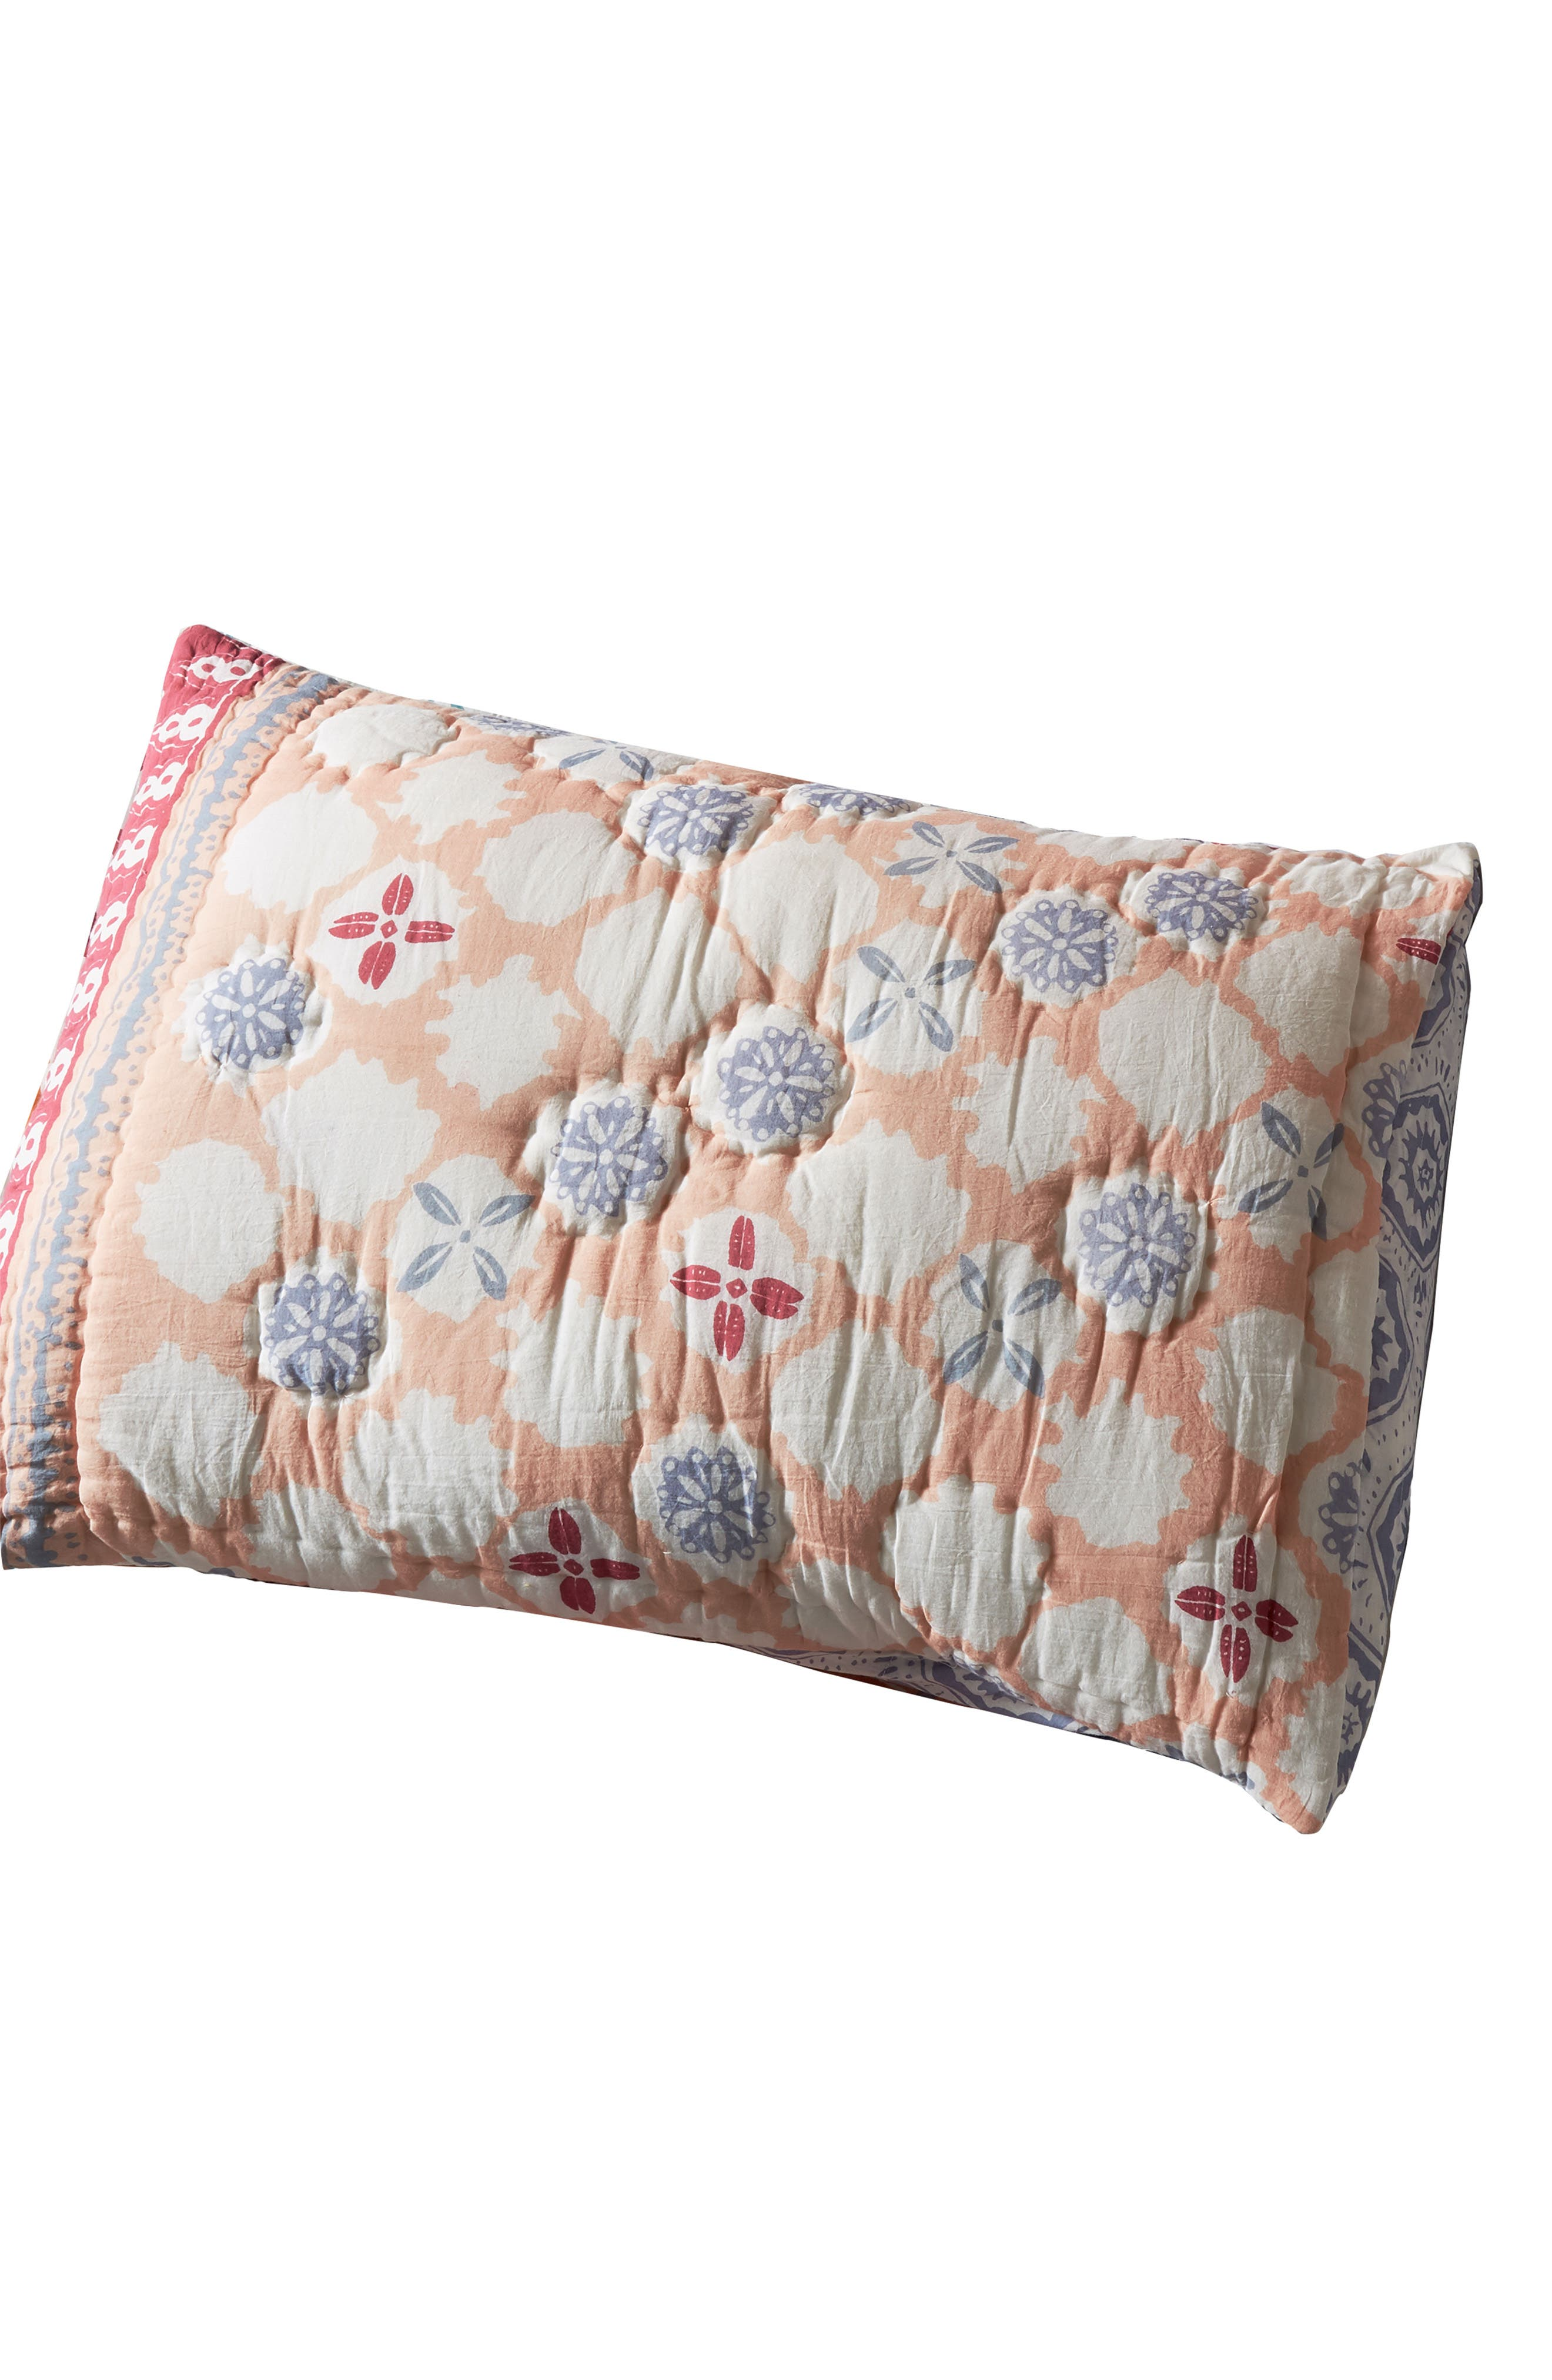 Laterza Pillow Shams,                         Main,                         color, BLUE MULTI